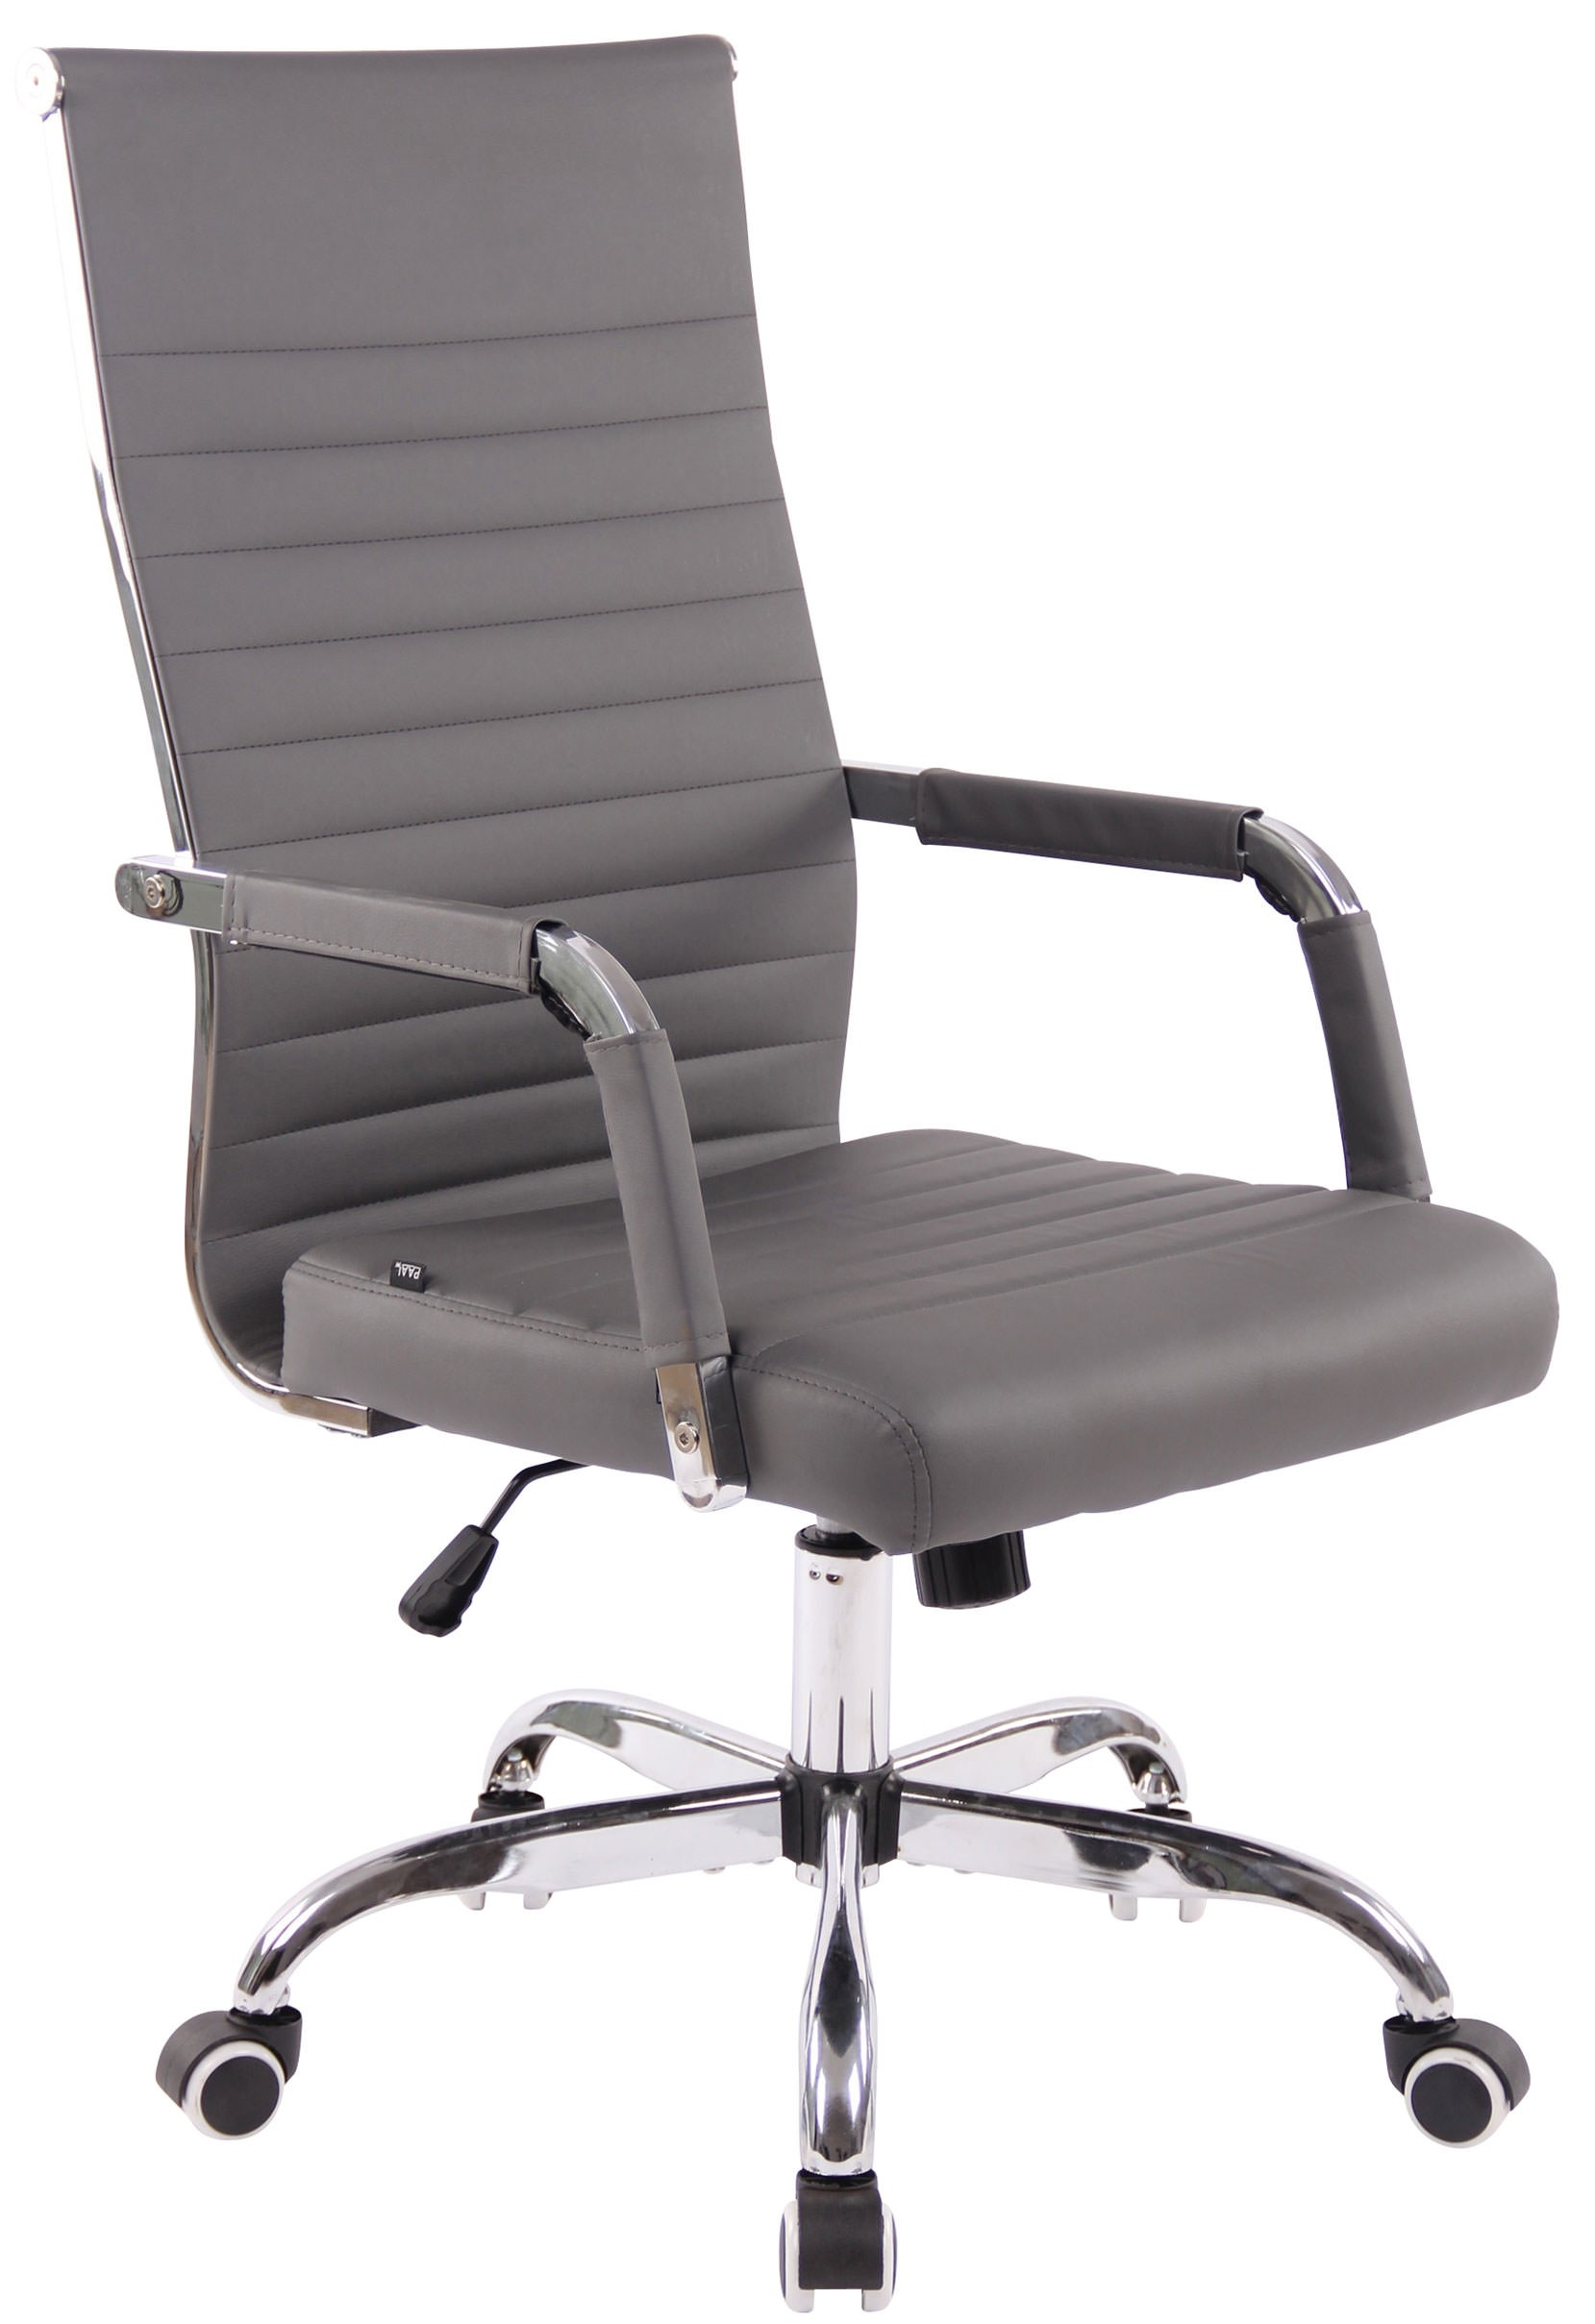 Chaise de bureau Amadora en Similicuir